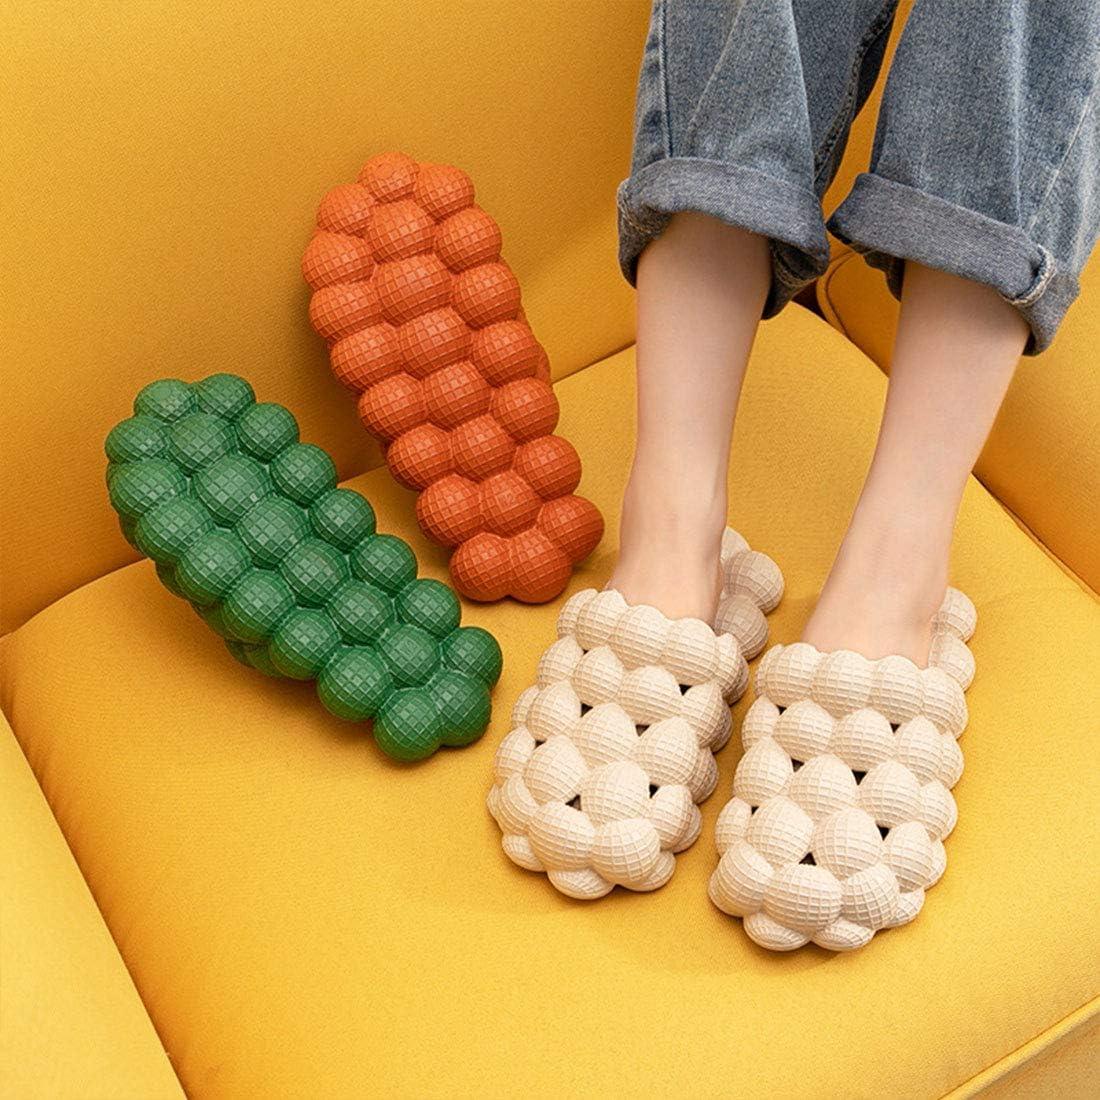 Funny Bubble Slippers,Reflexology Flip Flop/Sandals for Women, Super Soft Non-Slip Waterproof Summer Unisex Beach Massage Sandals